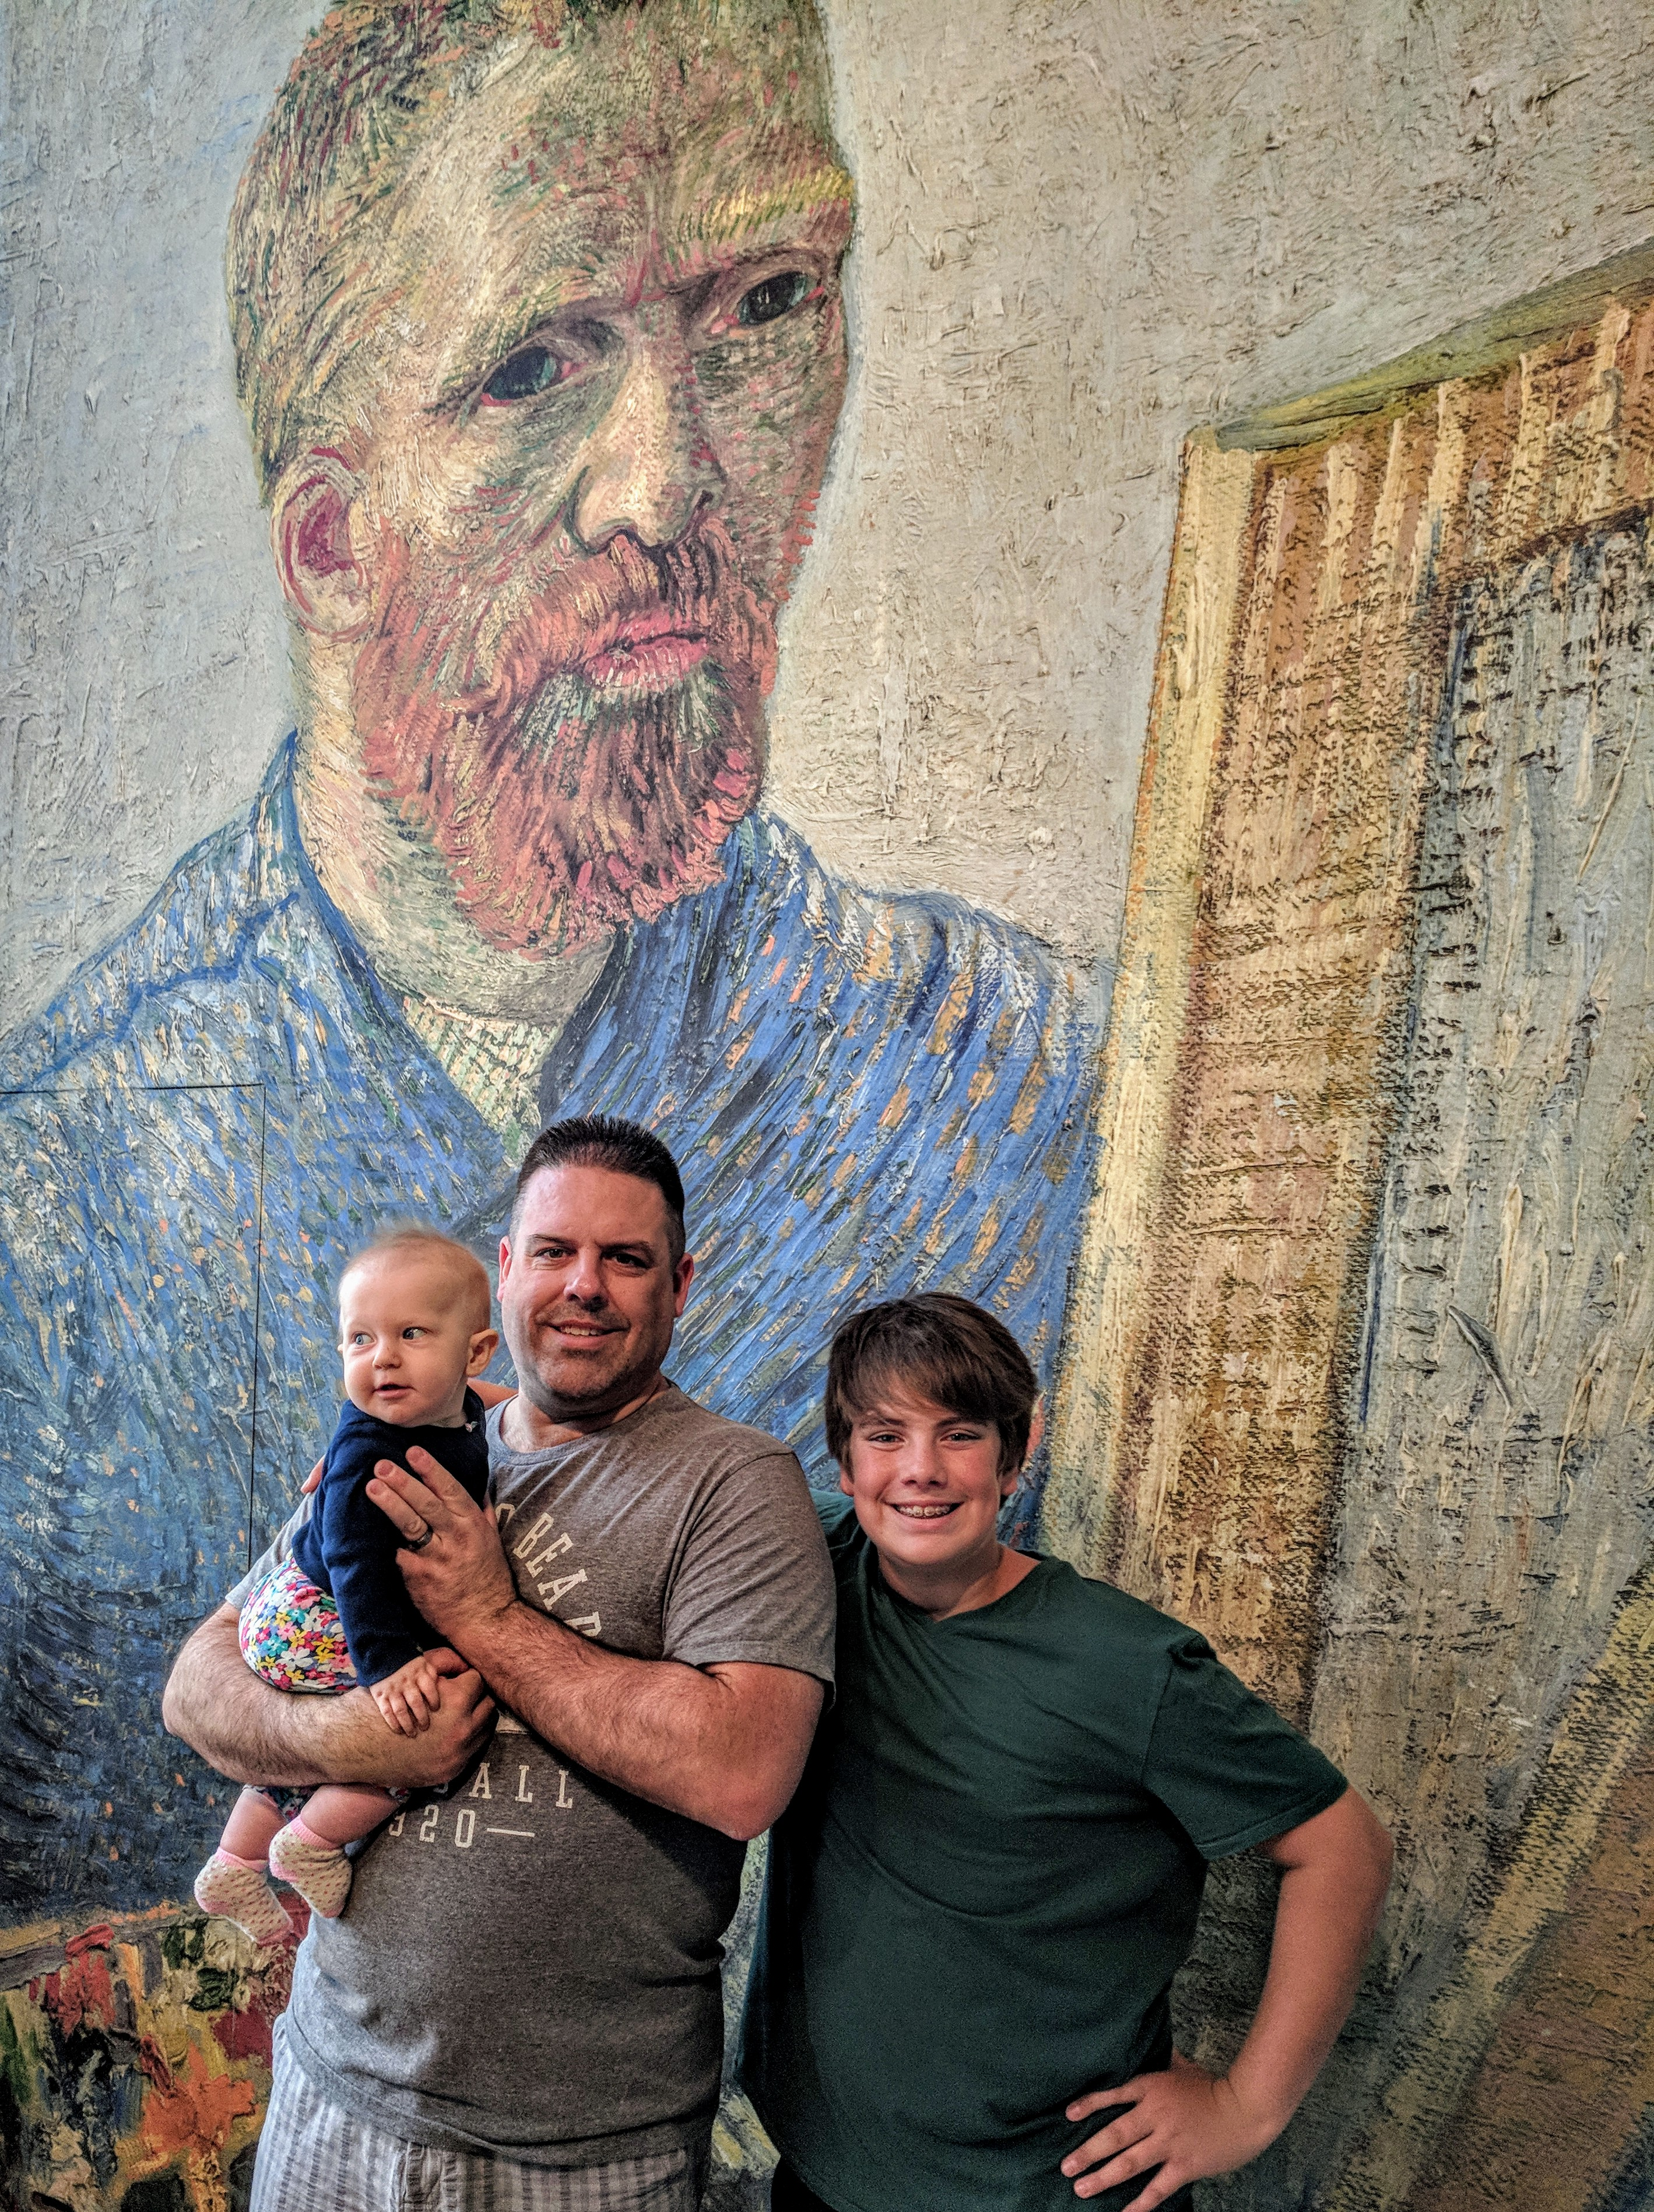 Family posing in front of Vincent Van Gogh portrait at Vincent Van Gogh Musuem